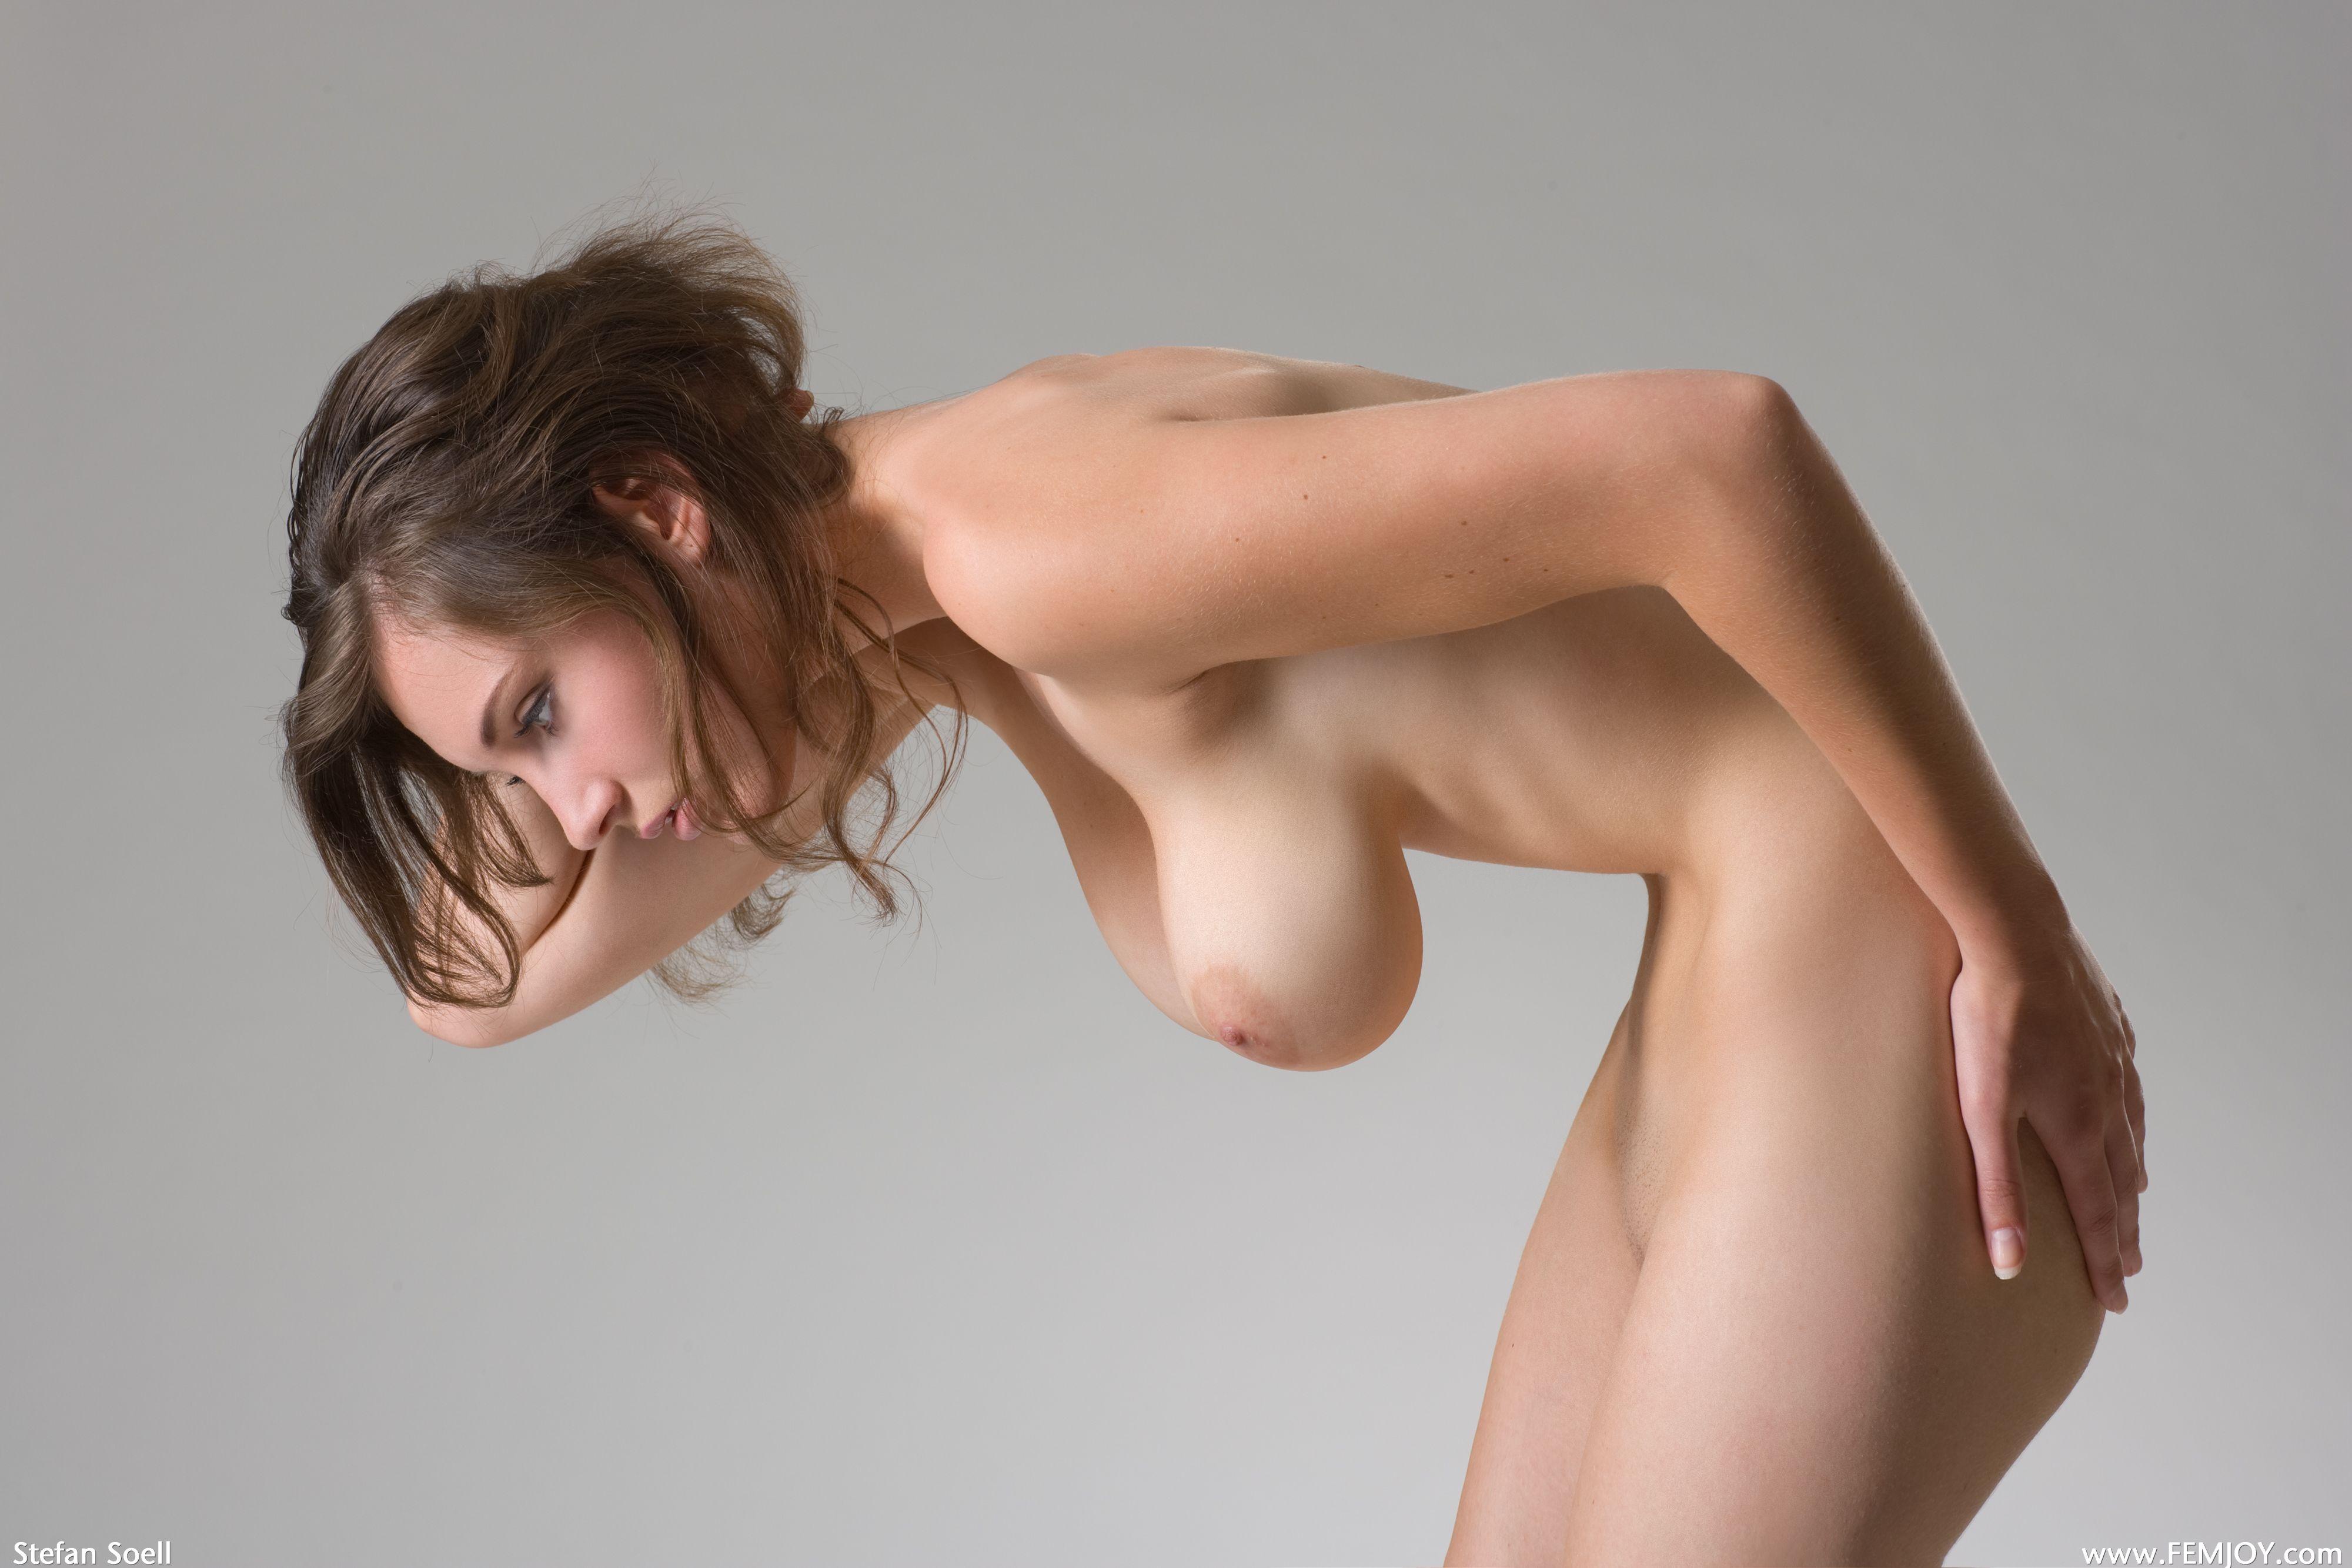 Стоячая грудь онлайн 4 фотография